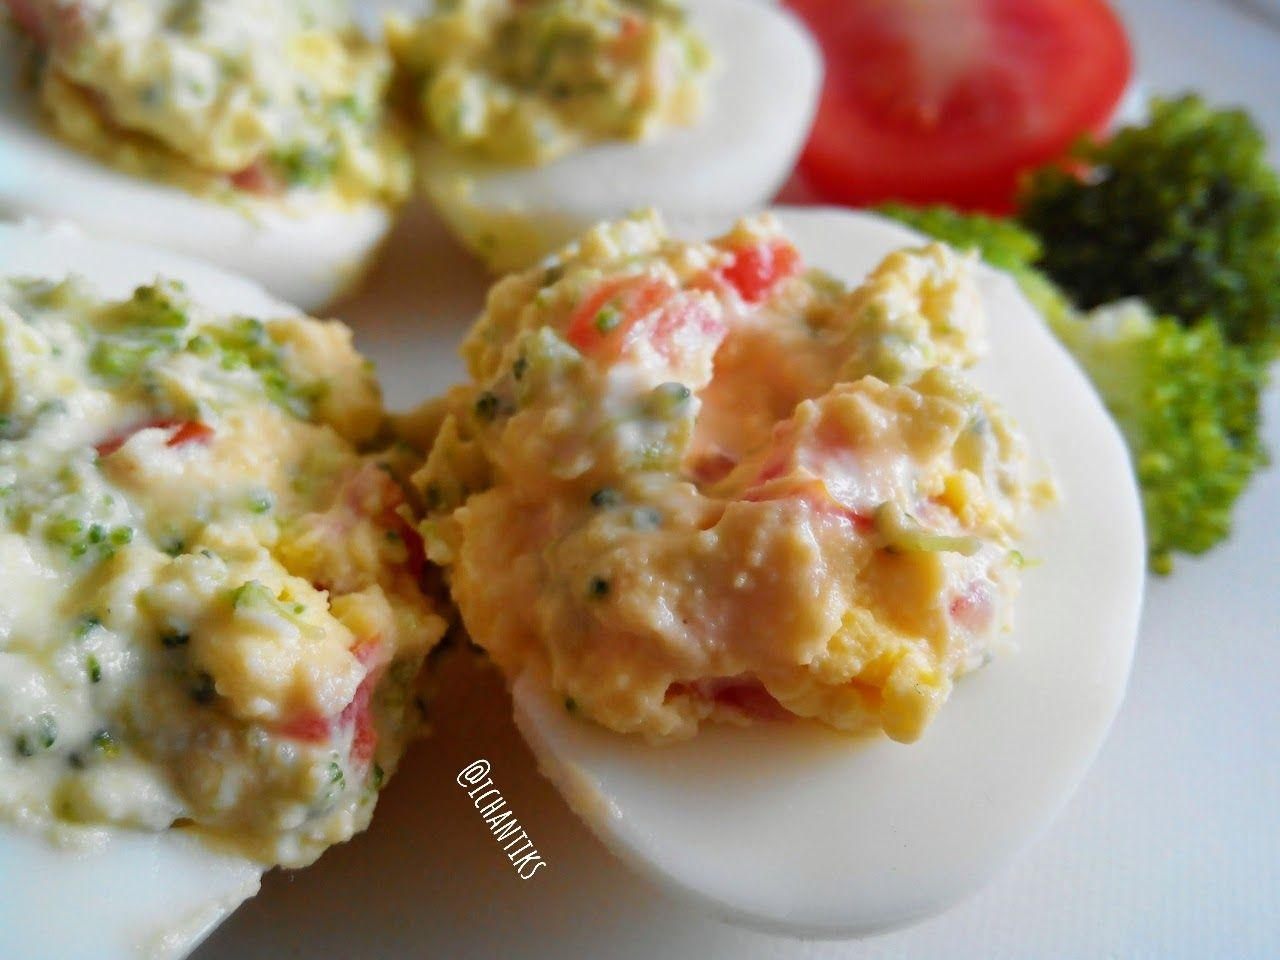 Cerita Mami Kenzie Resep Mpasi Telur Pesta 1y Resep Makanan Bayi Resep Resep Masakan